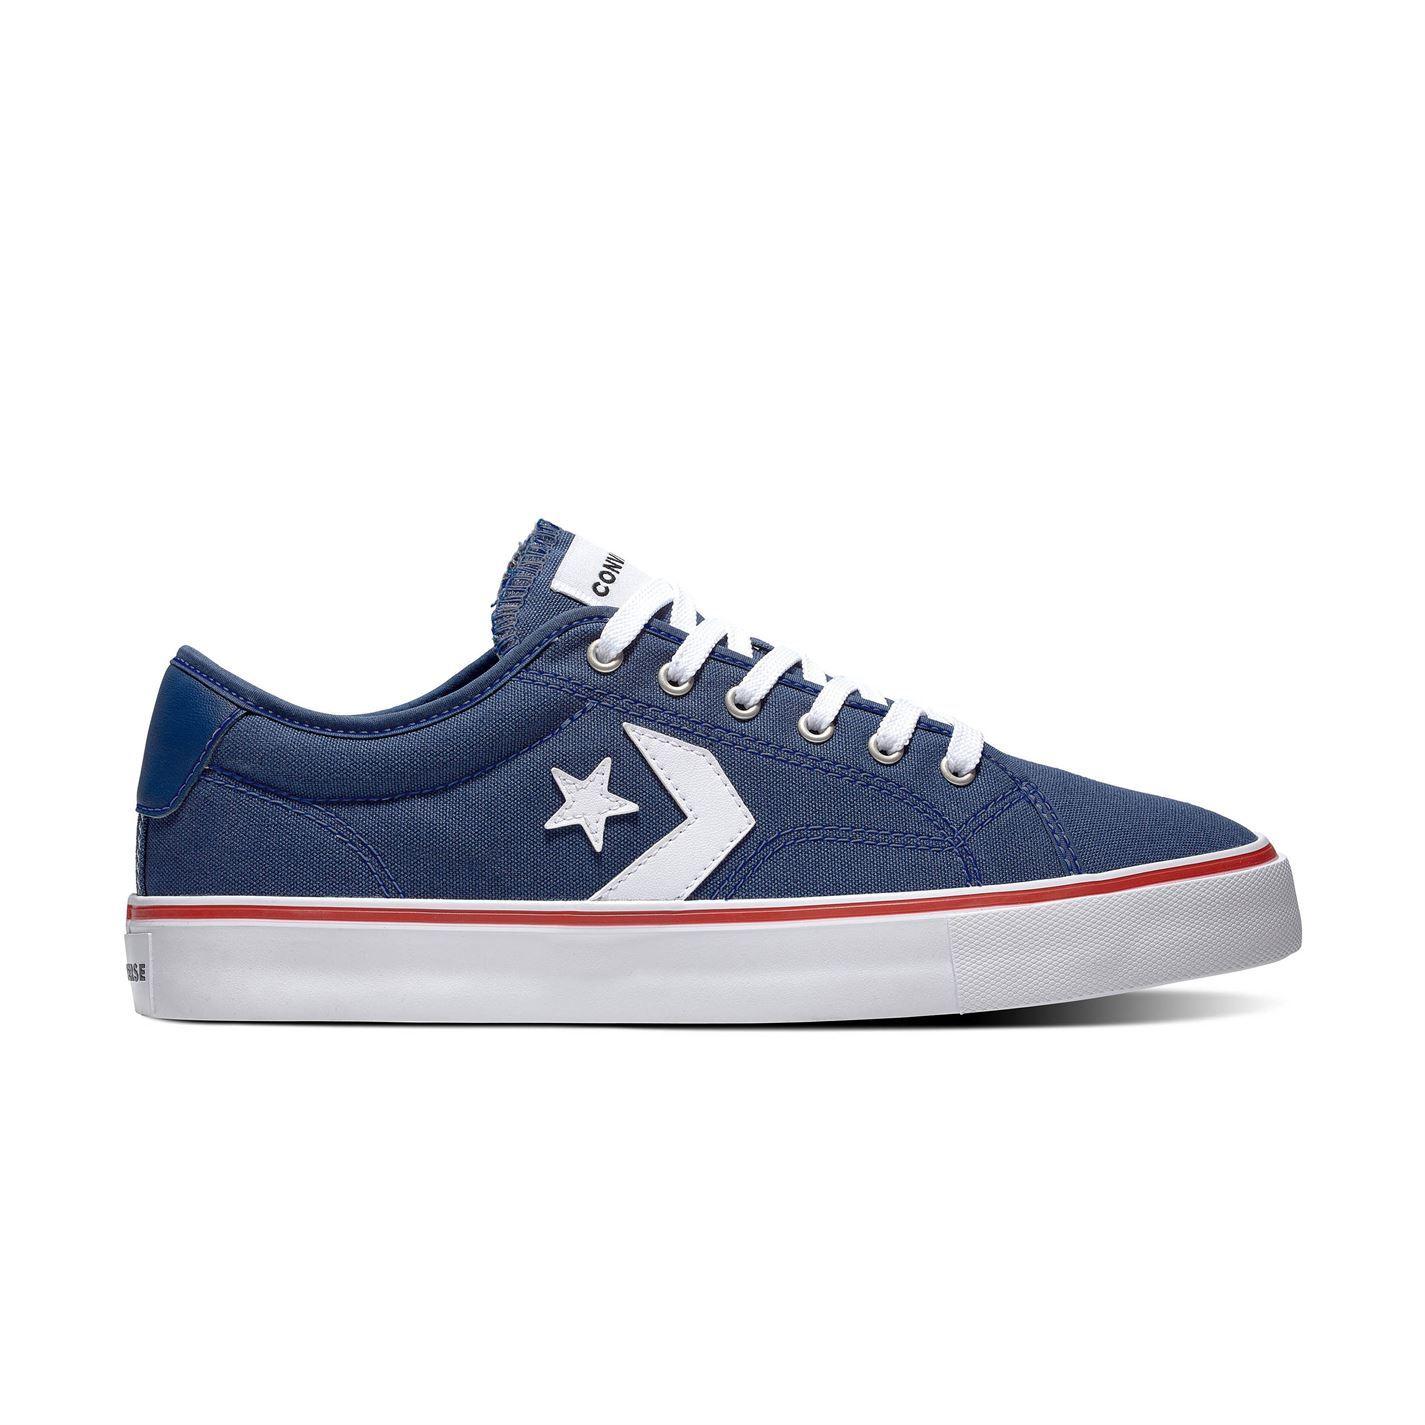 Converse-Ox-REPLAY-Baskets-Pour-Homme-Chaussures-De-Loisirs-Chaussures-Baskets miniature 12